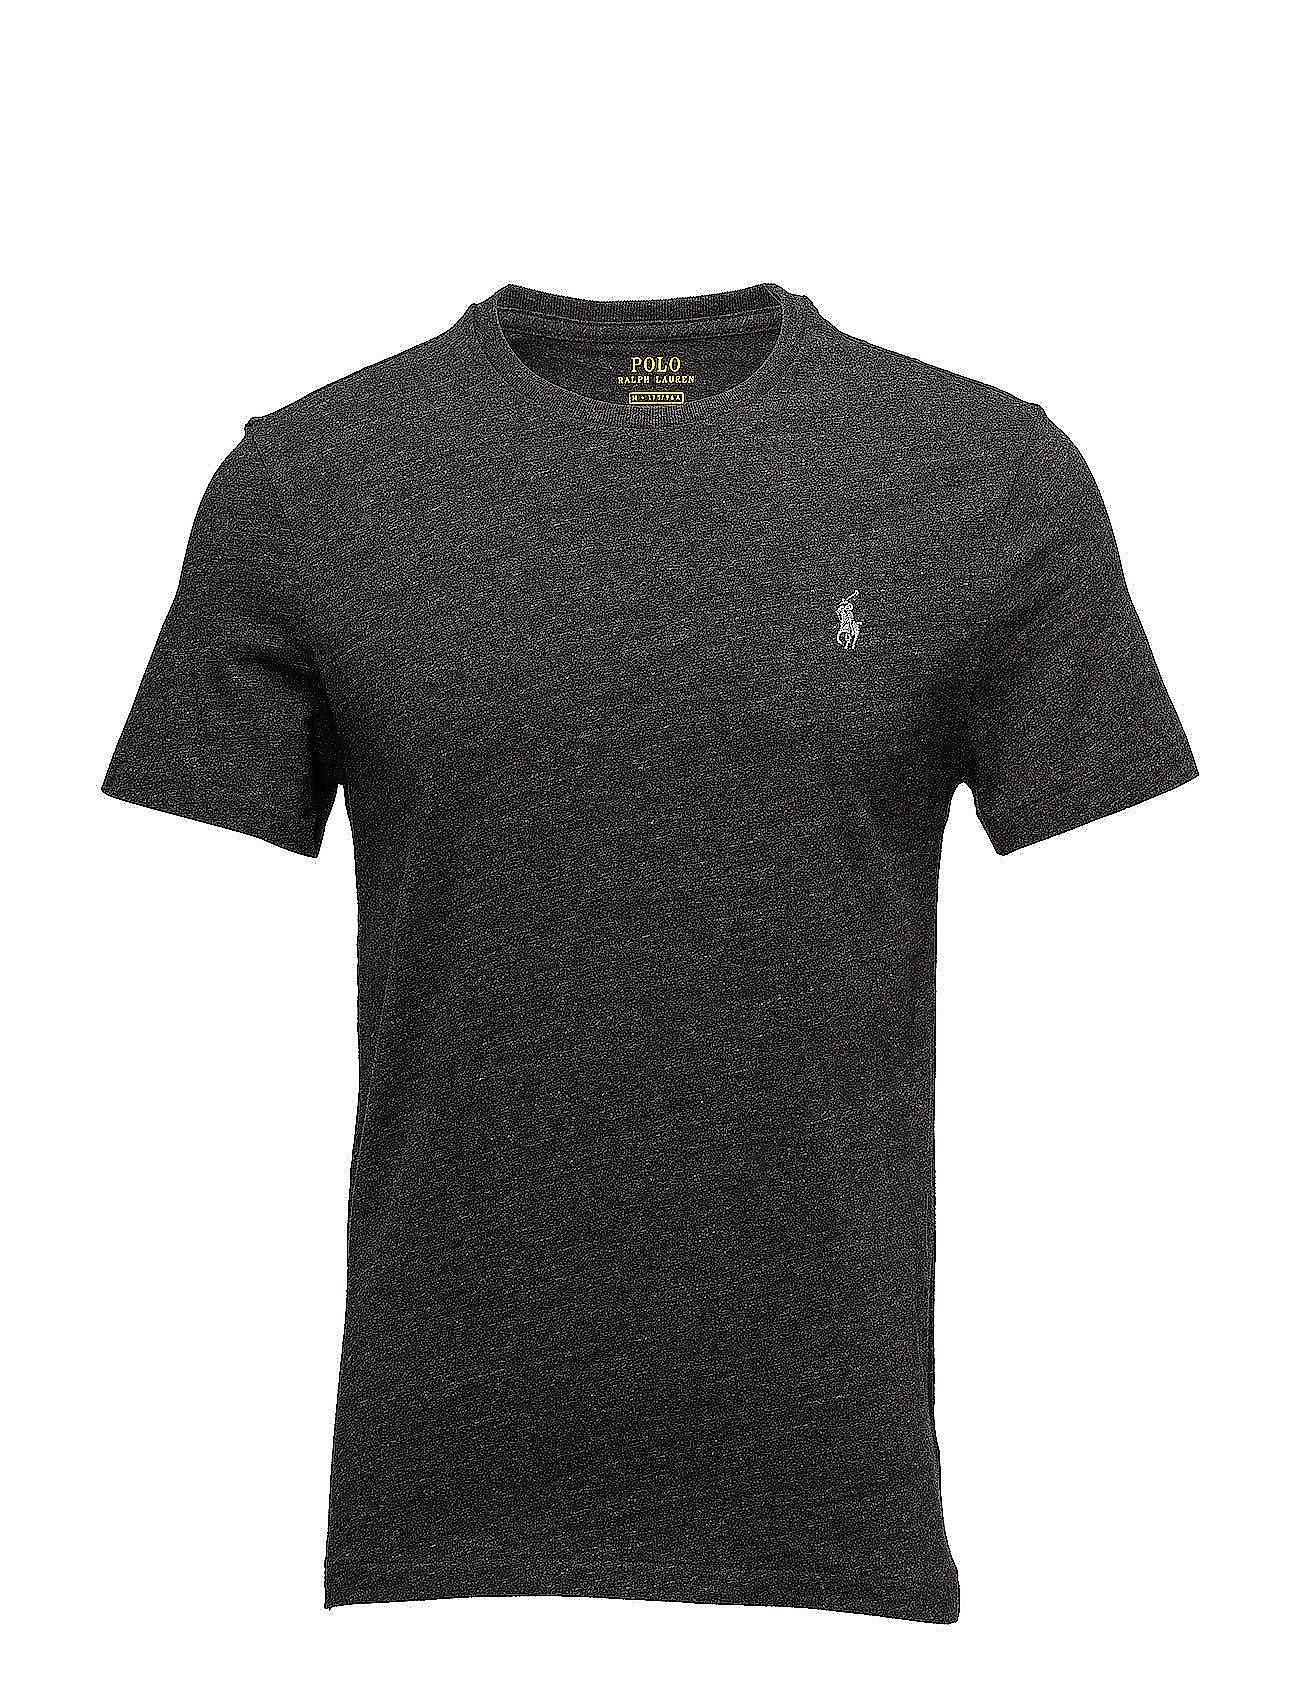 Polo Ralph Lauren Custom Slim Fit Cotton T-Shirt - BLACK MARL HEATHE